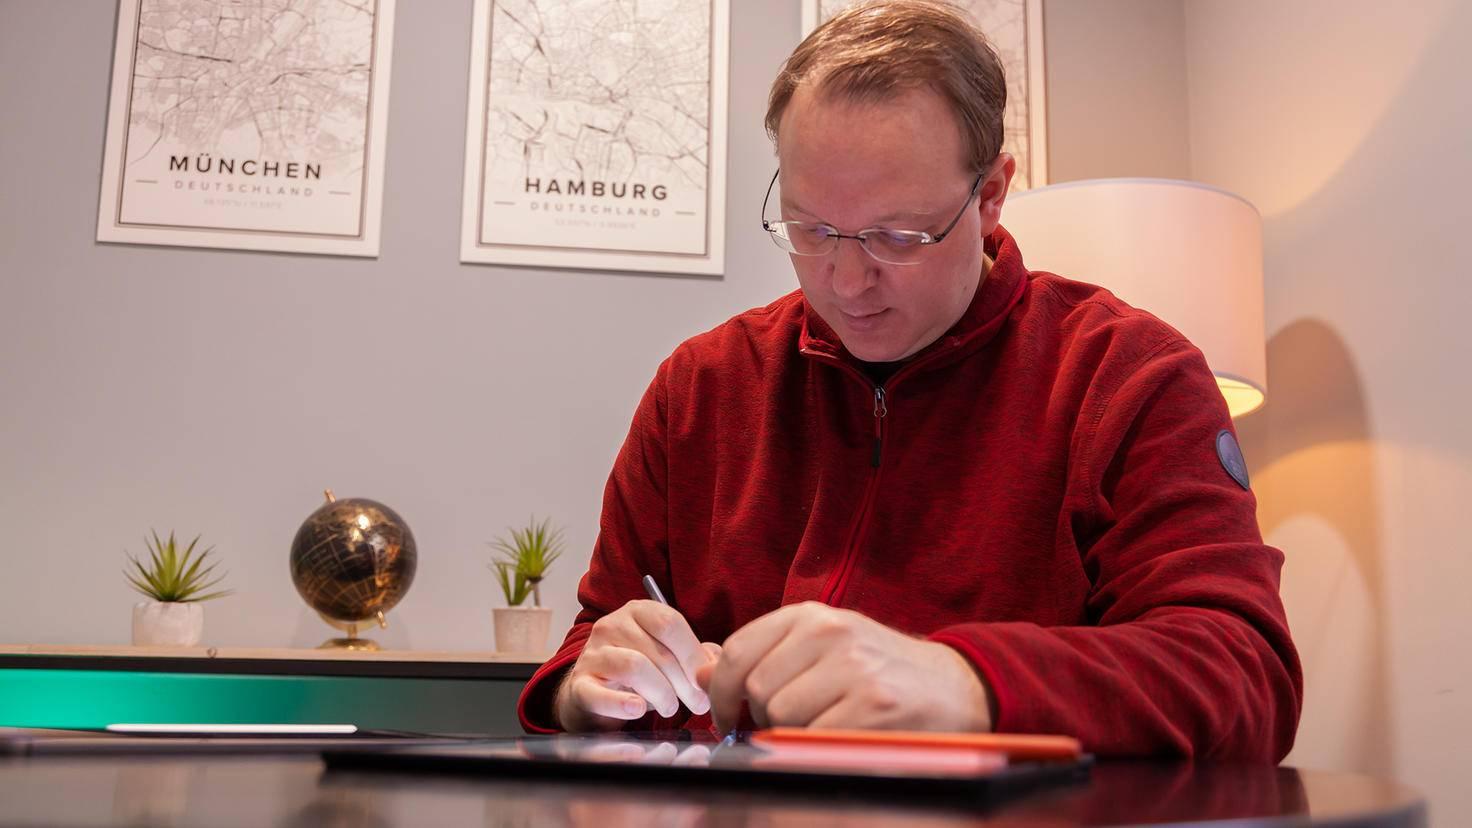 grafik-tablet-stylus-stift-pen-vergleich